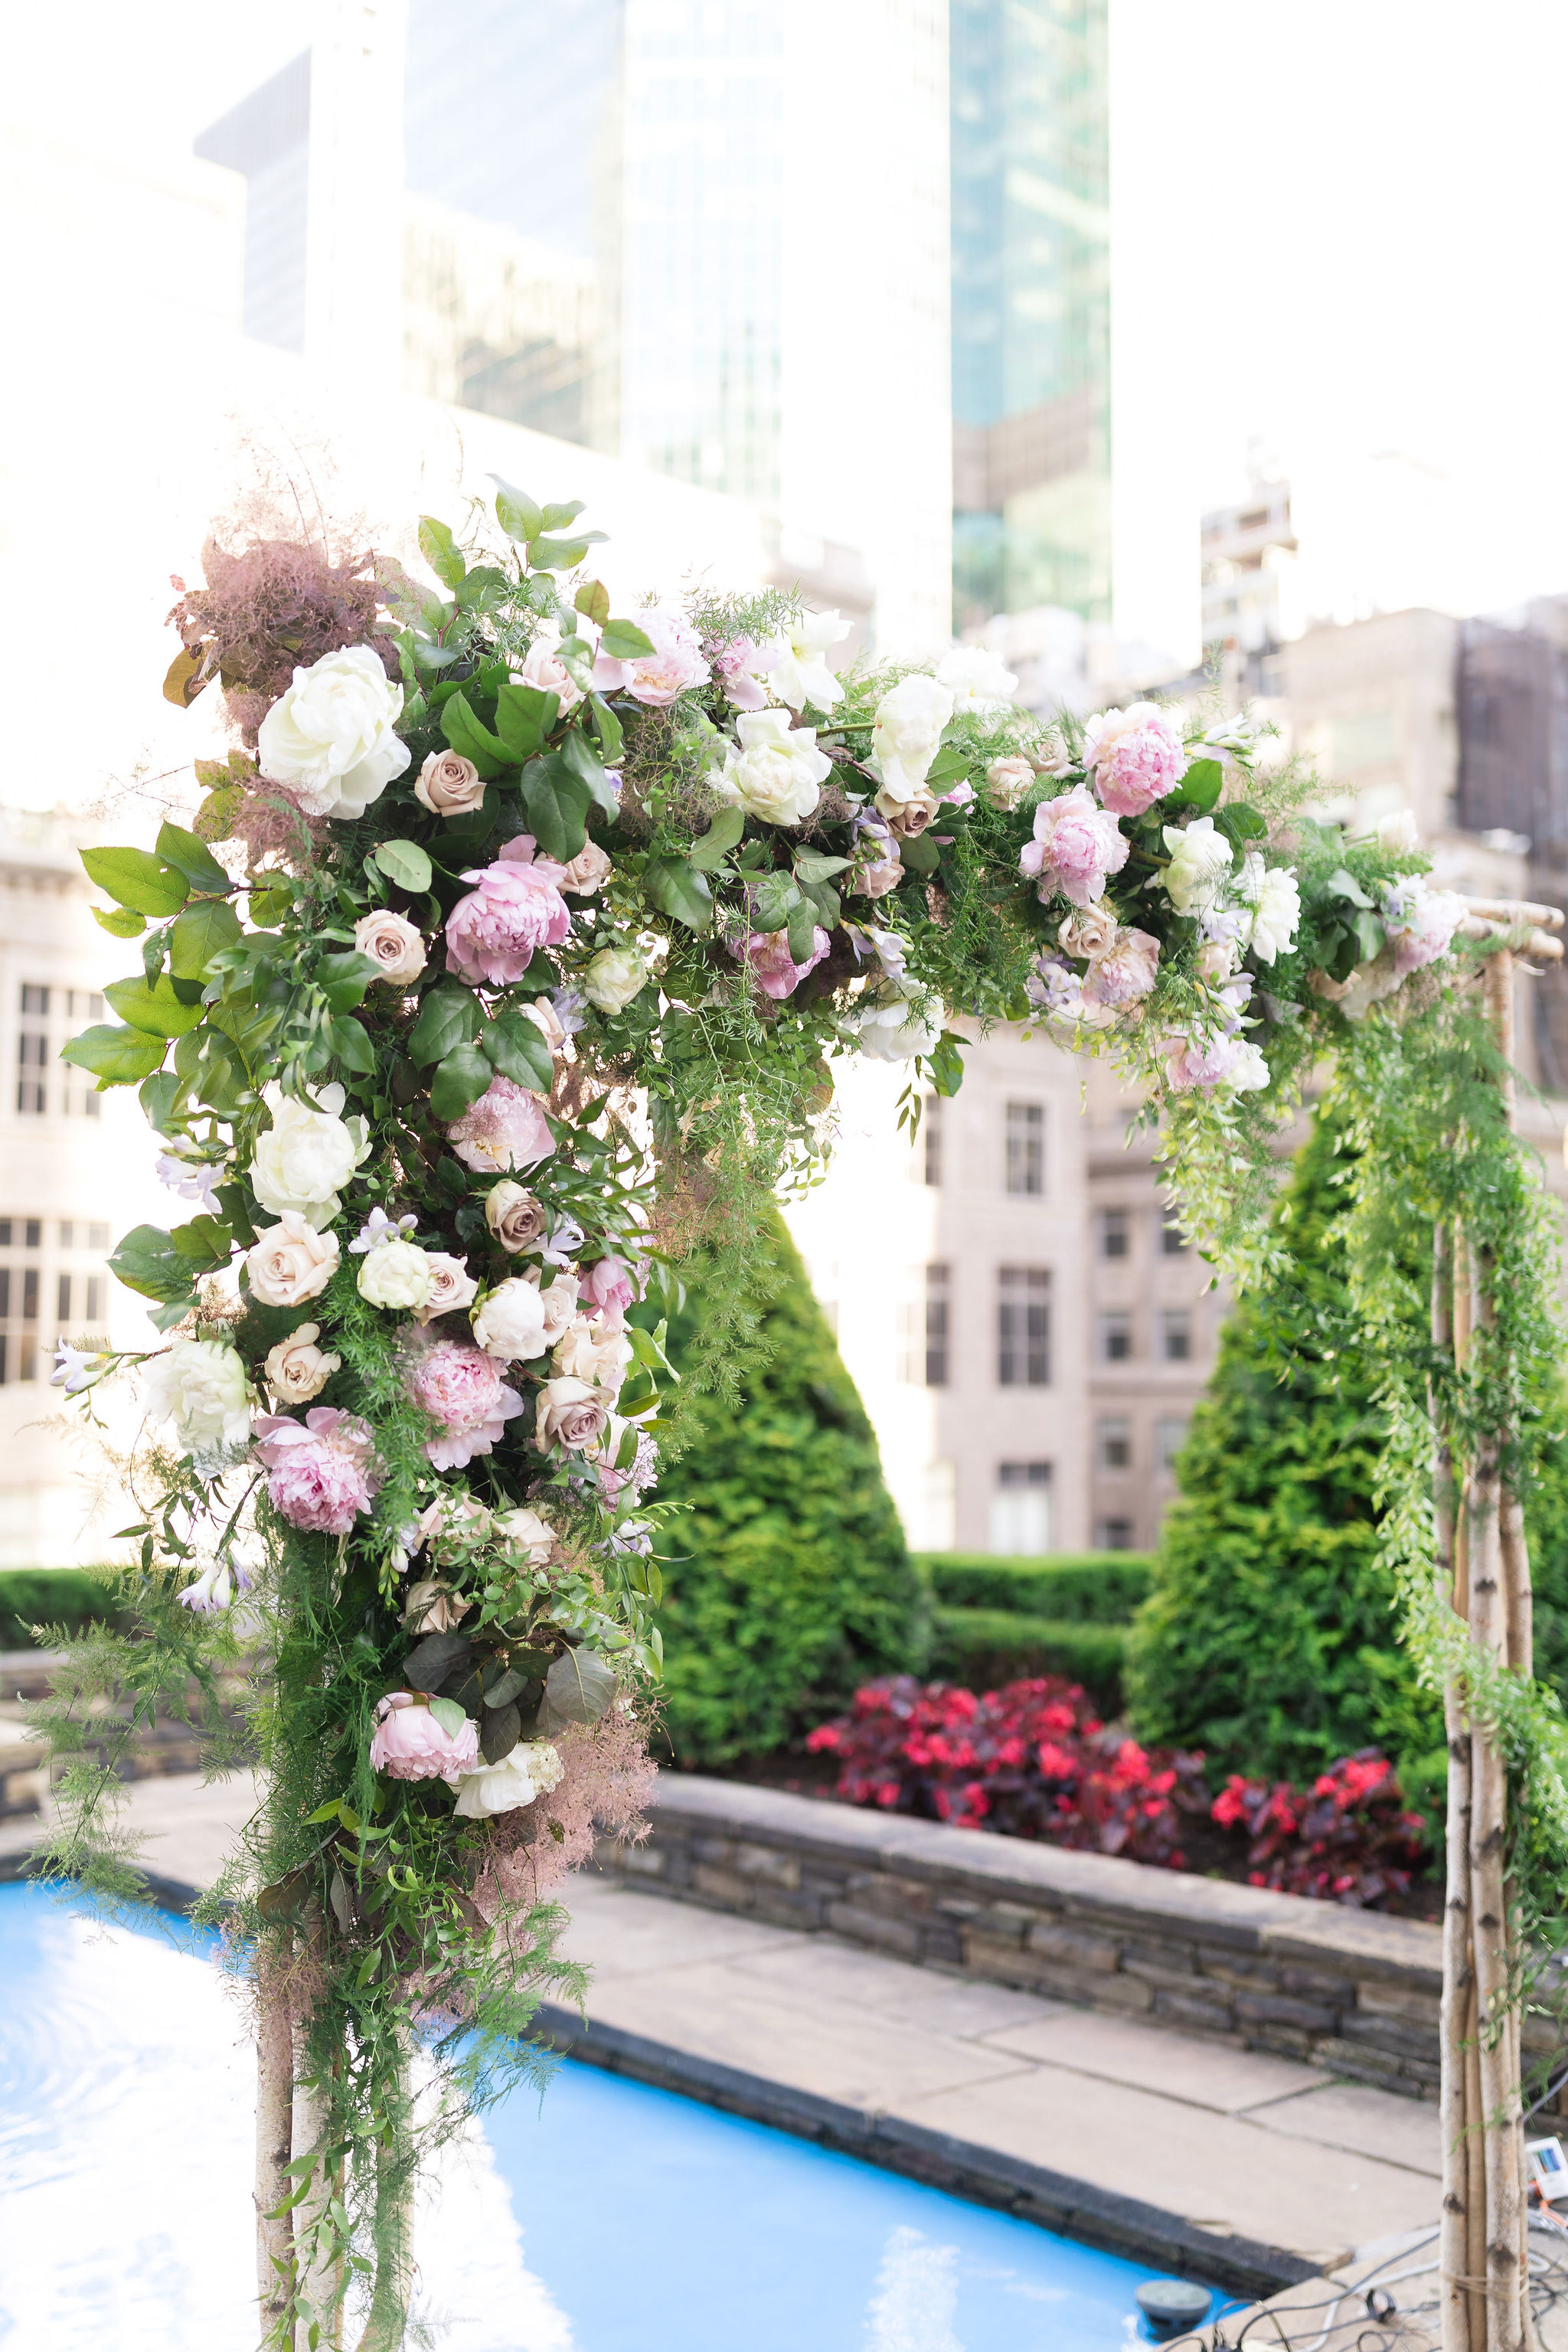 Photography:  Chris and Becca Photography   Planning:  Color Pop Events   Venue:  620 Loft & Garden